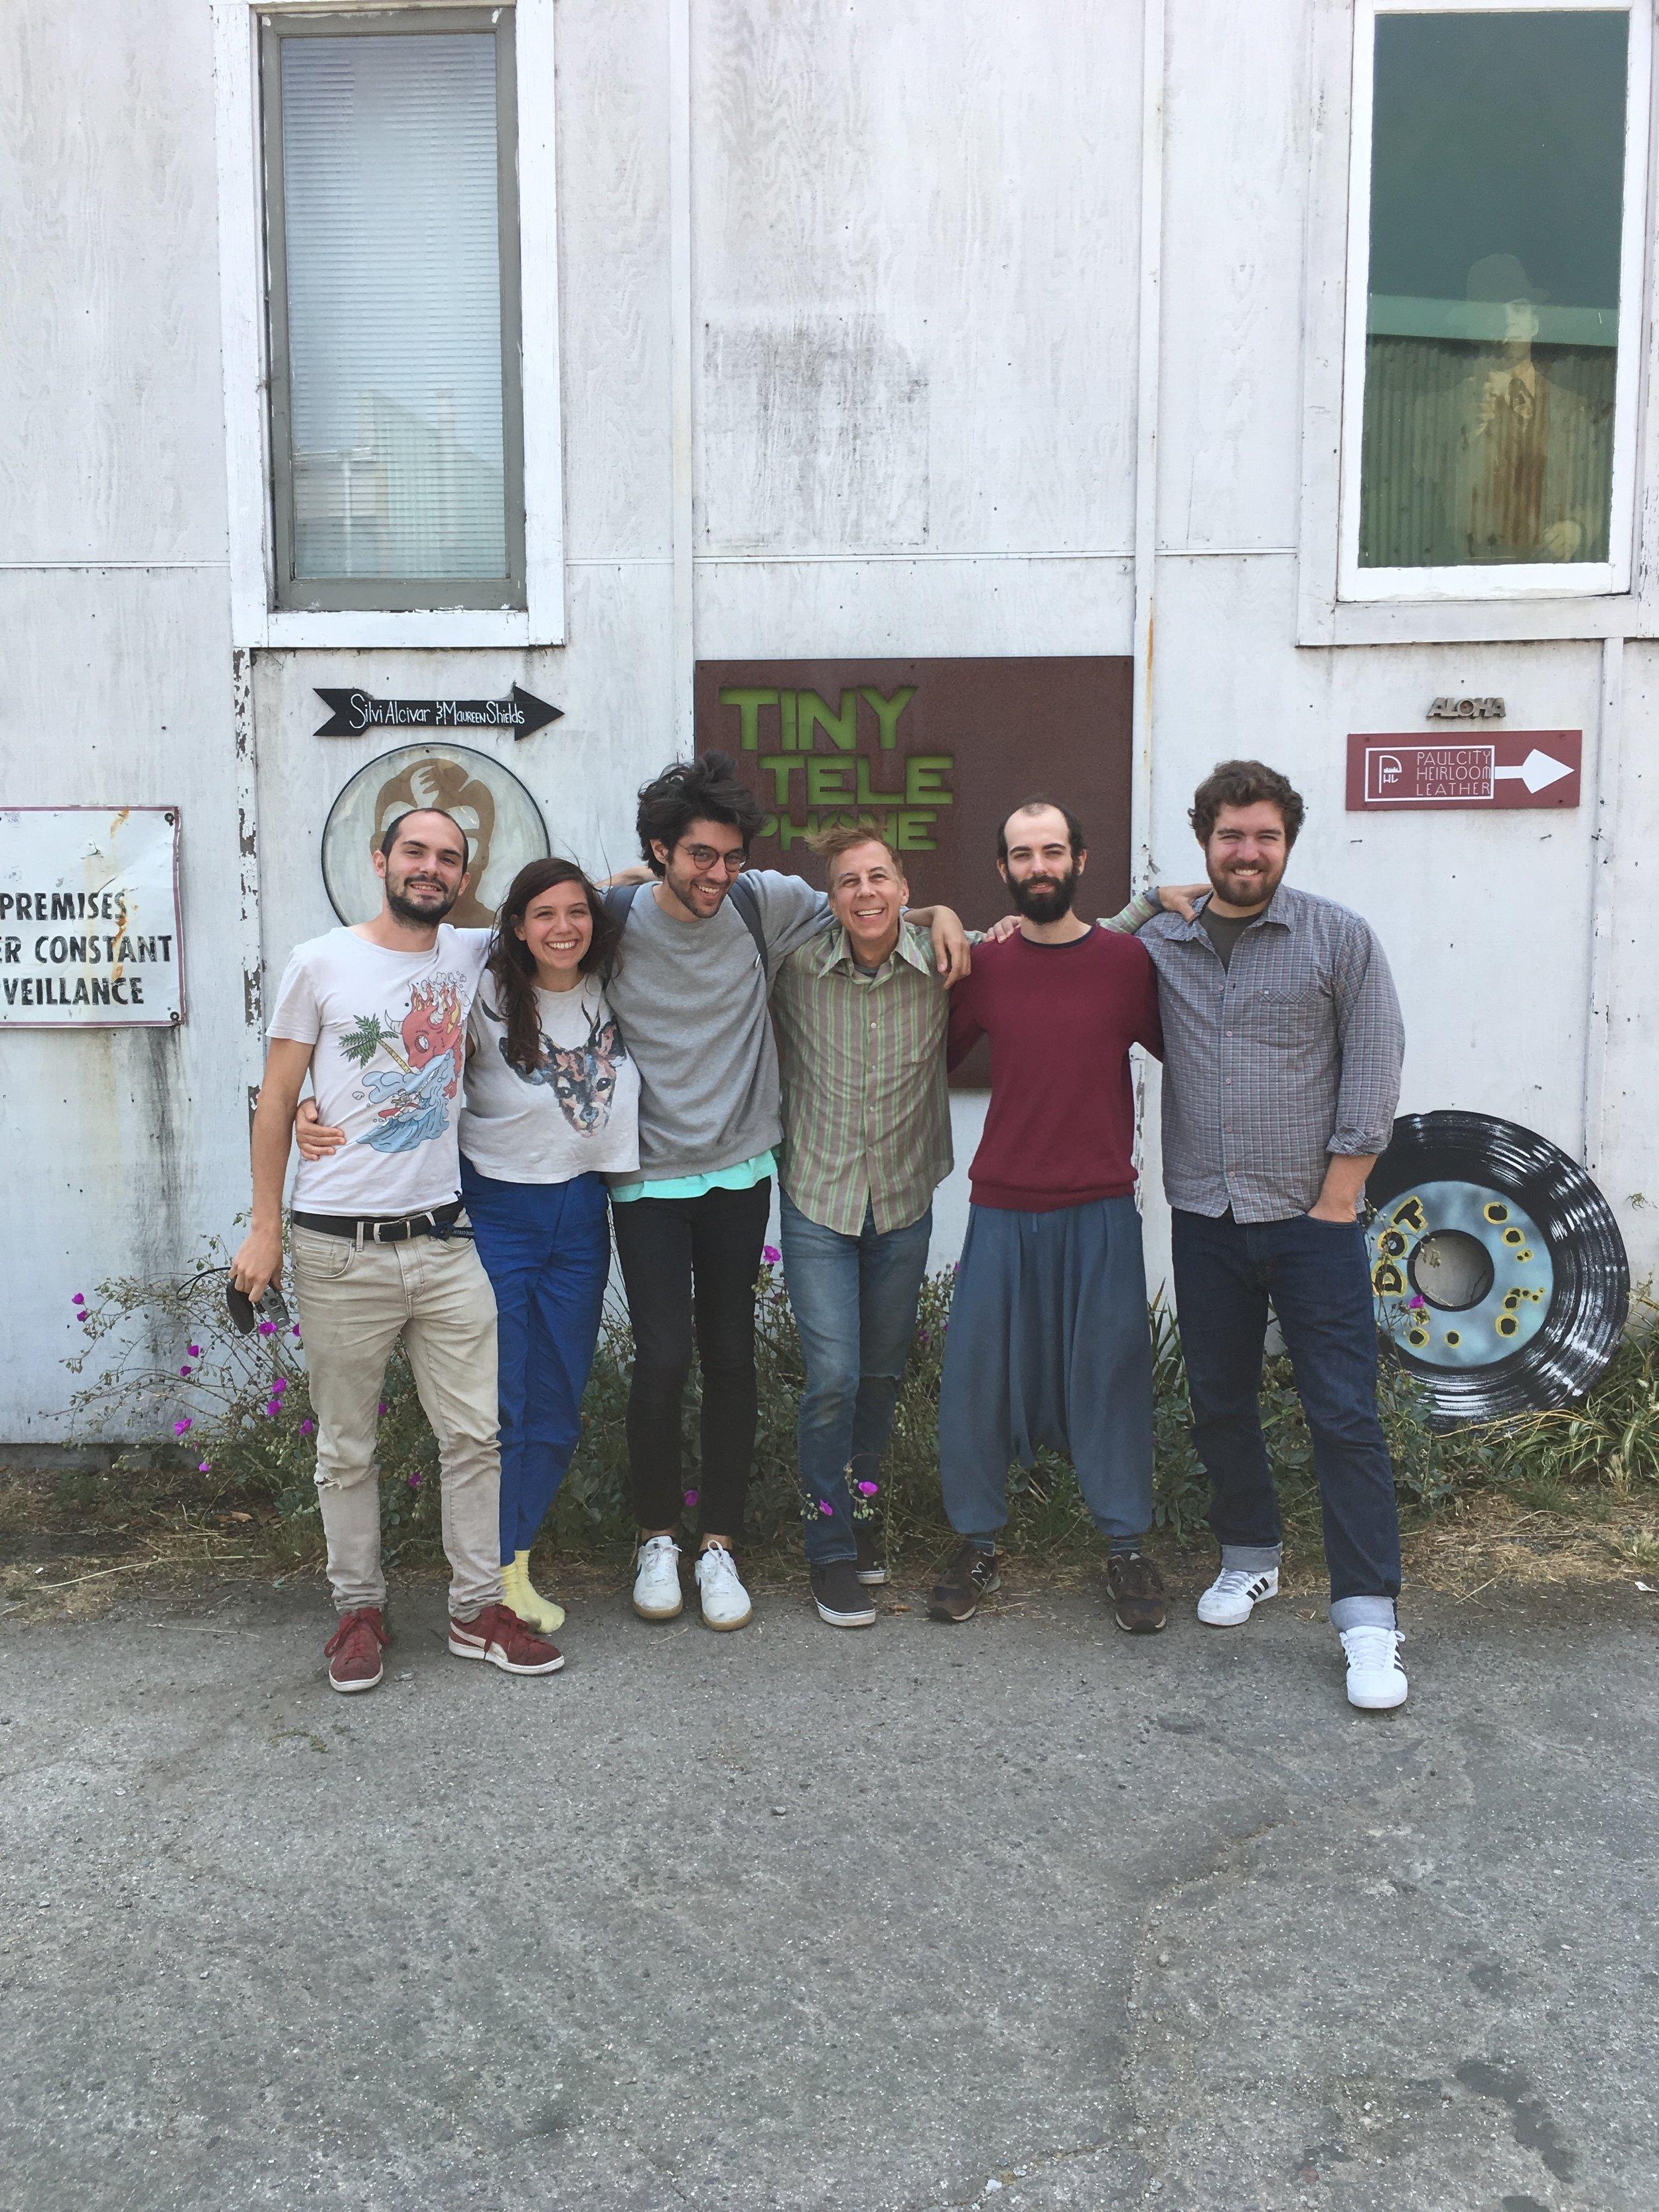 From left to right: Jeremie Revel, Gina Été, Omar Akrouche (engineer, assistant), John Vanderslice (producer), Noé Franklé, Phillip Klawitter